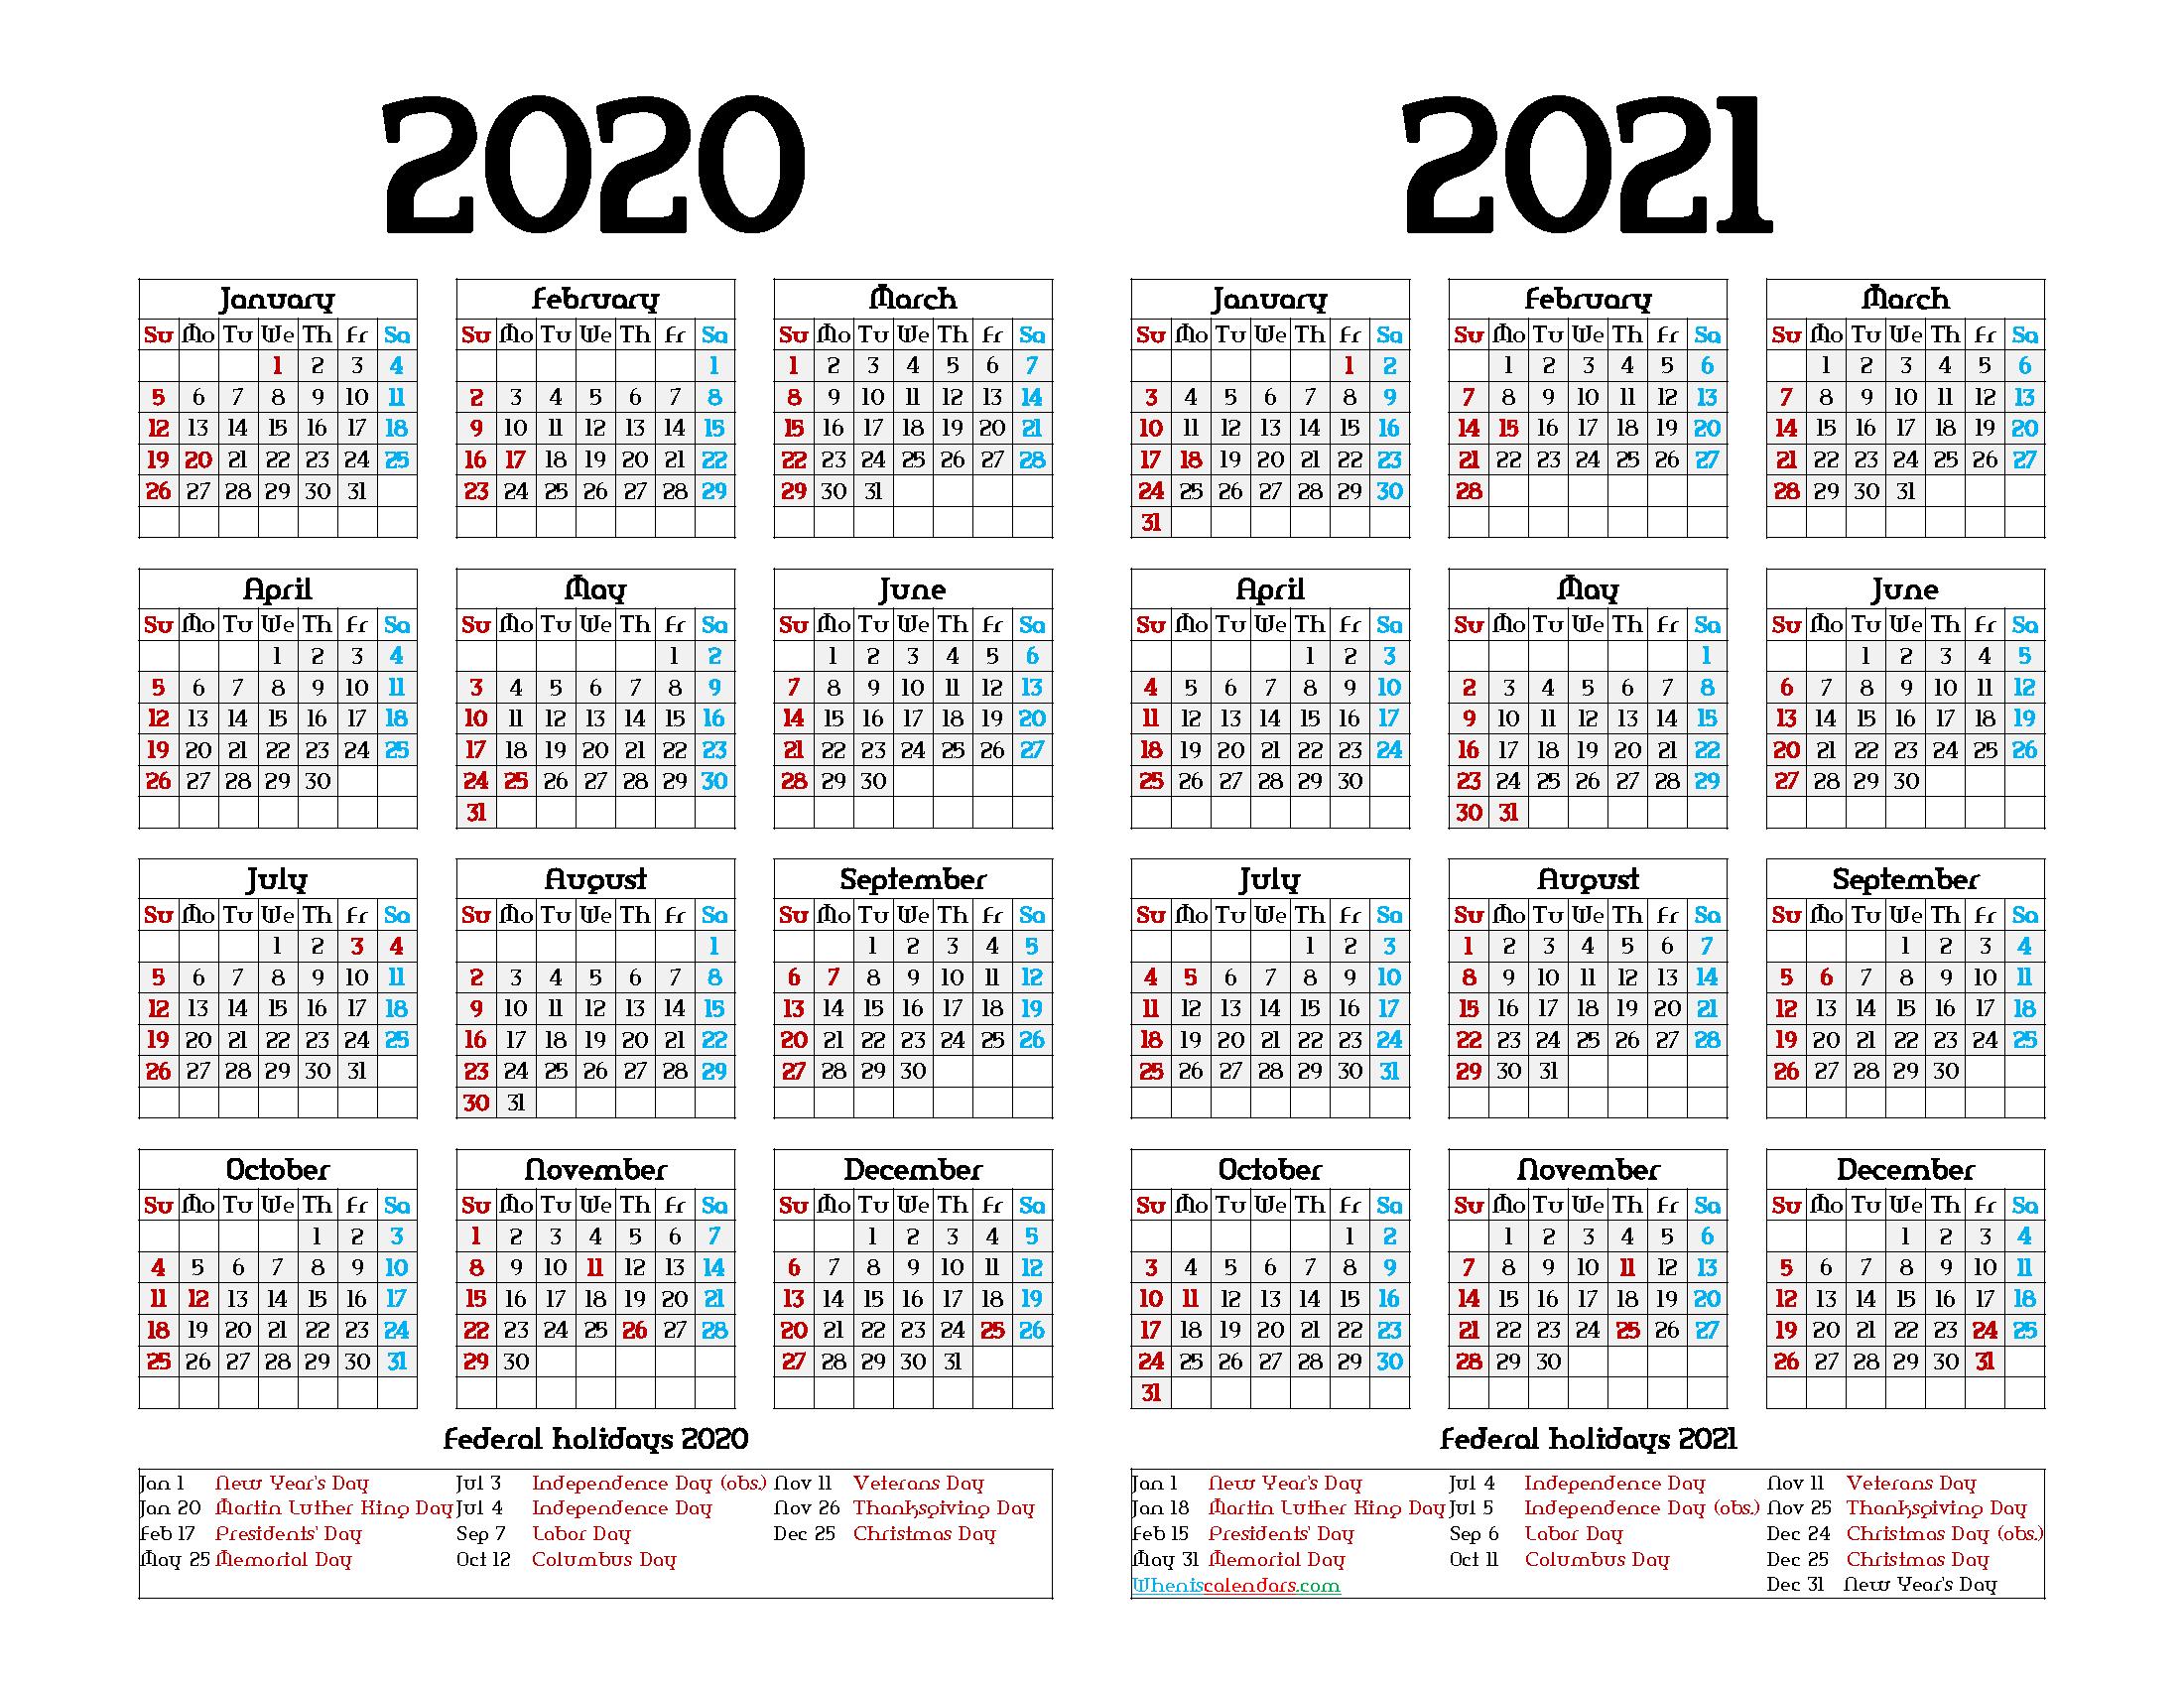 Printable 2020 and 2021 Calendar with Holidays